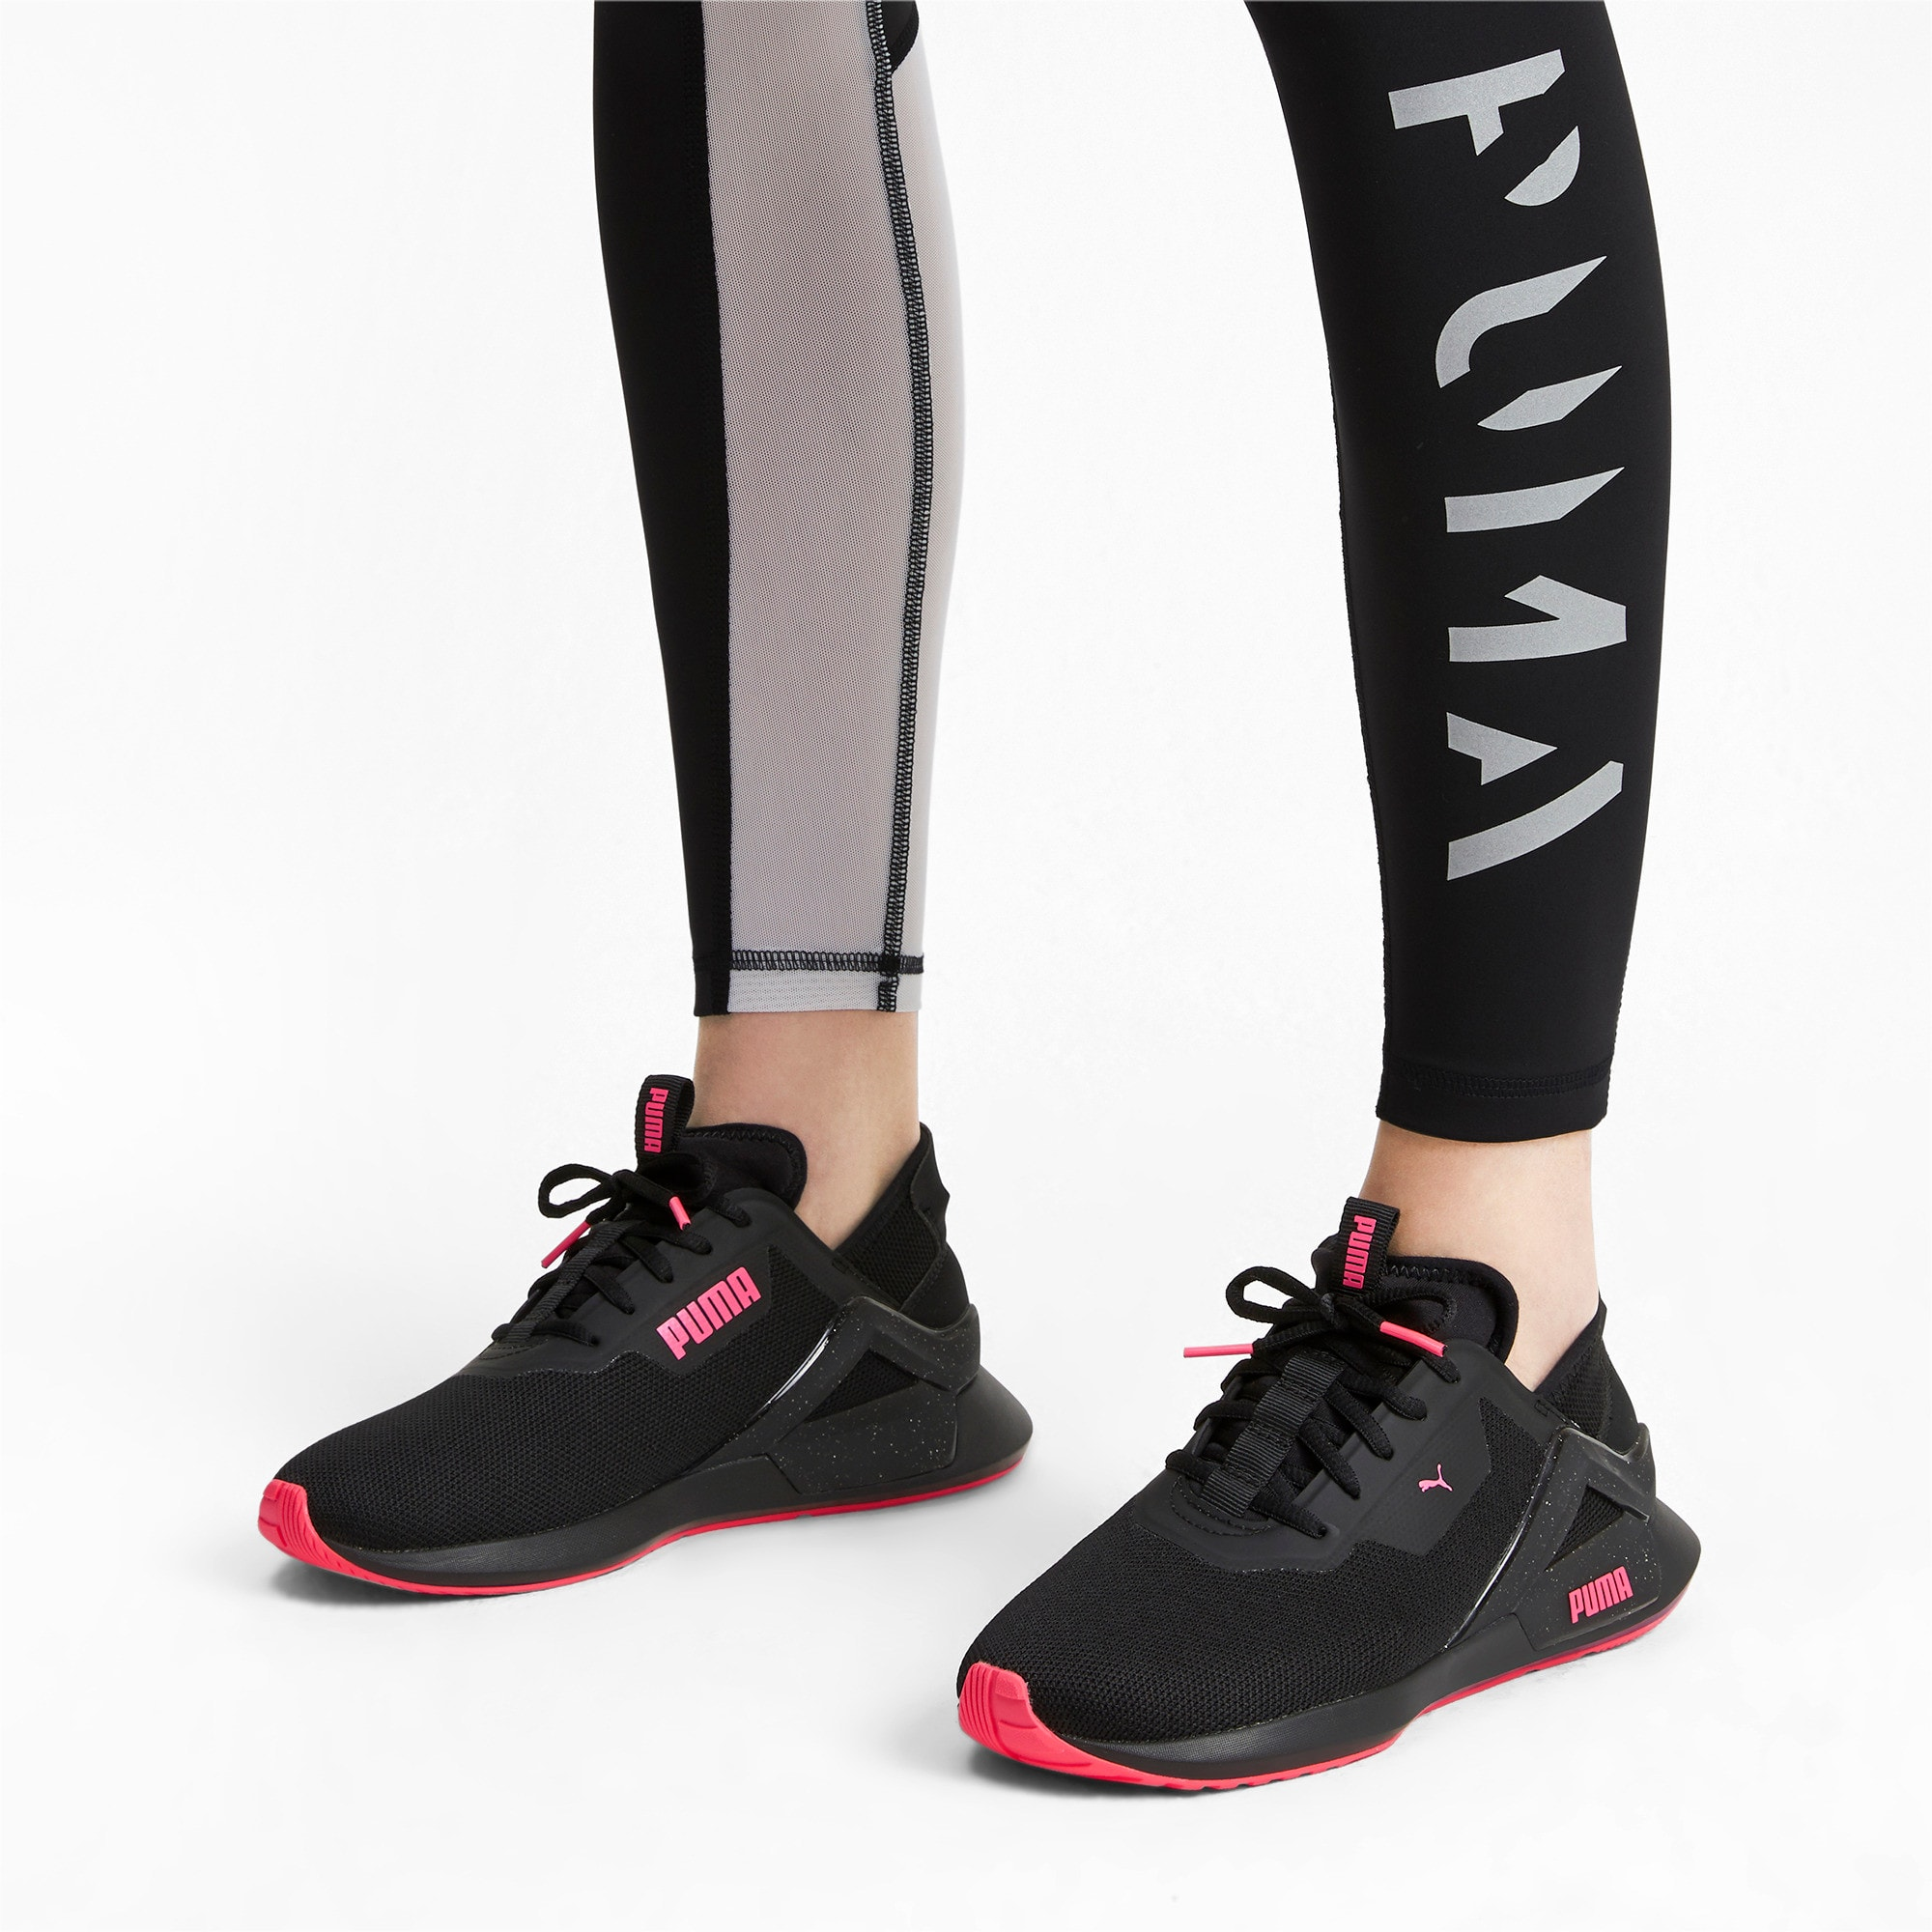 Thumbnail 2 of Rogue X Knit Women's Running Shoes, Puma Black-Pink Alert, medium-IND